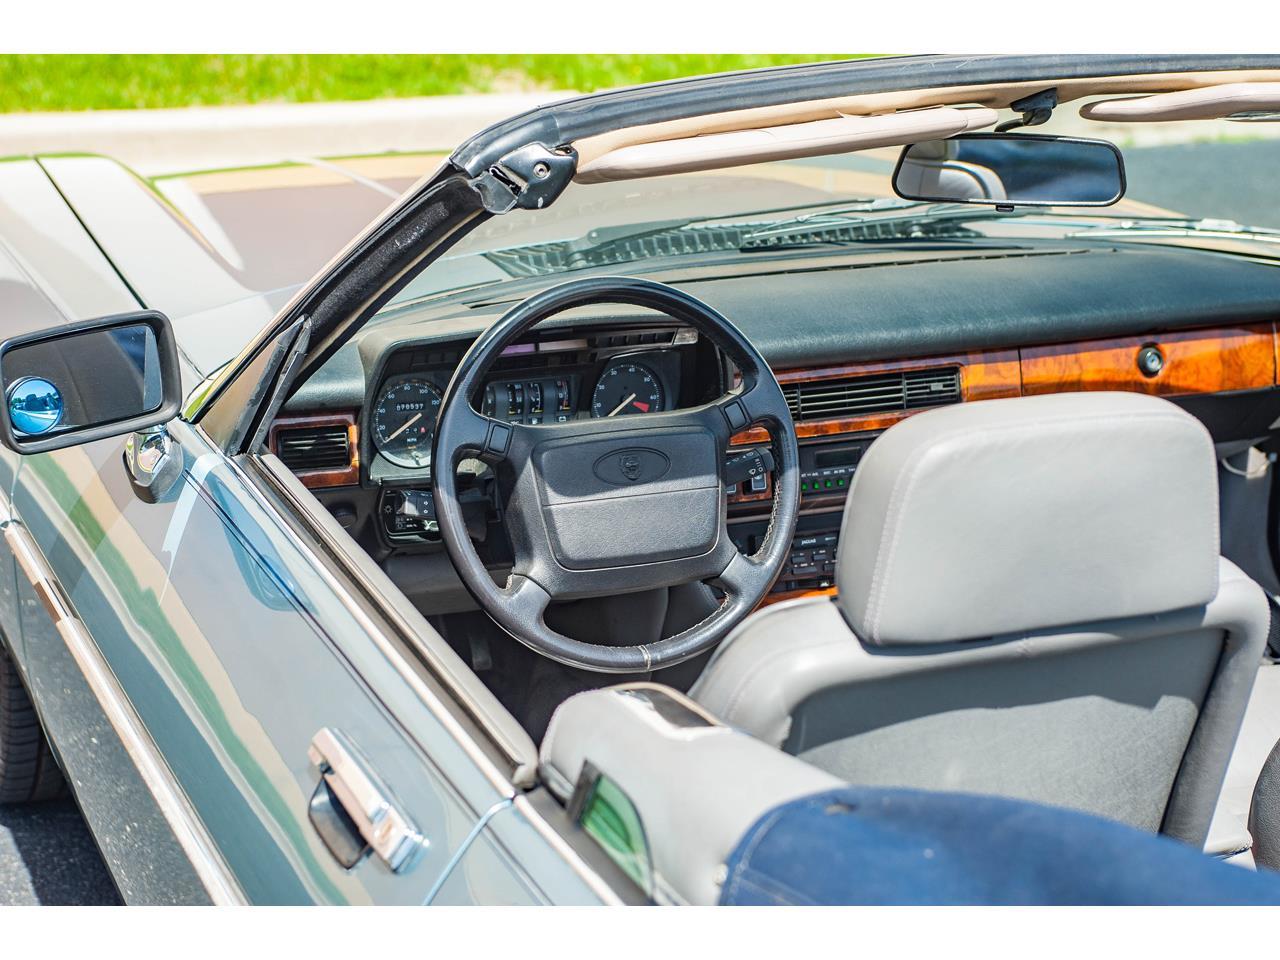 Large Picture of 1990 Jaguar XJS located in O'Fallon Illinois - $15,500.00 - QB9E